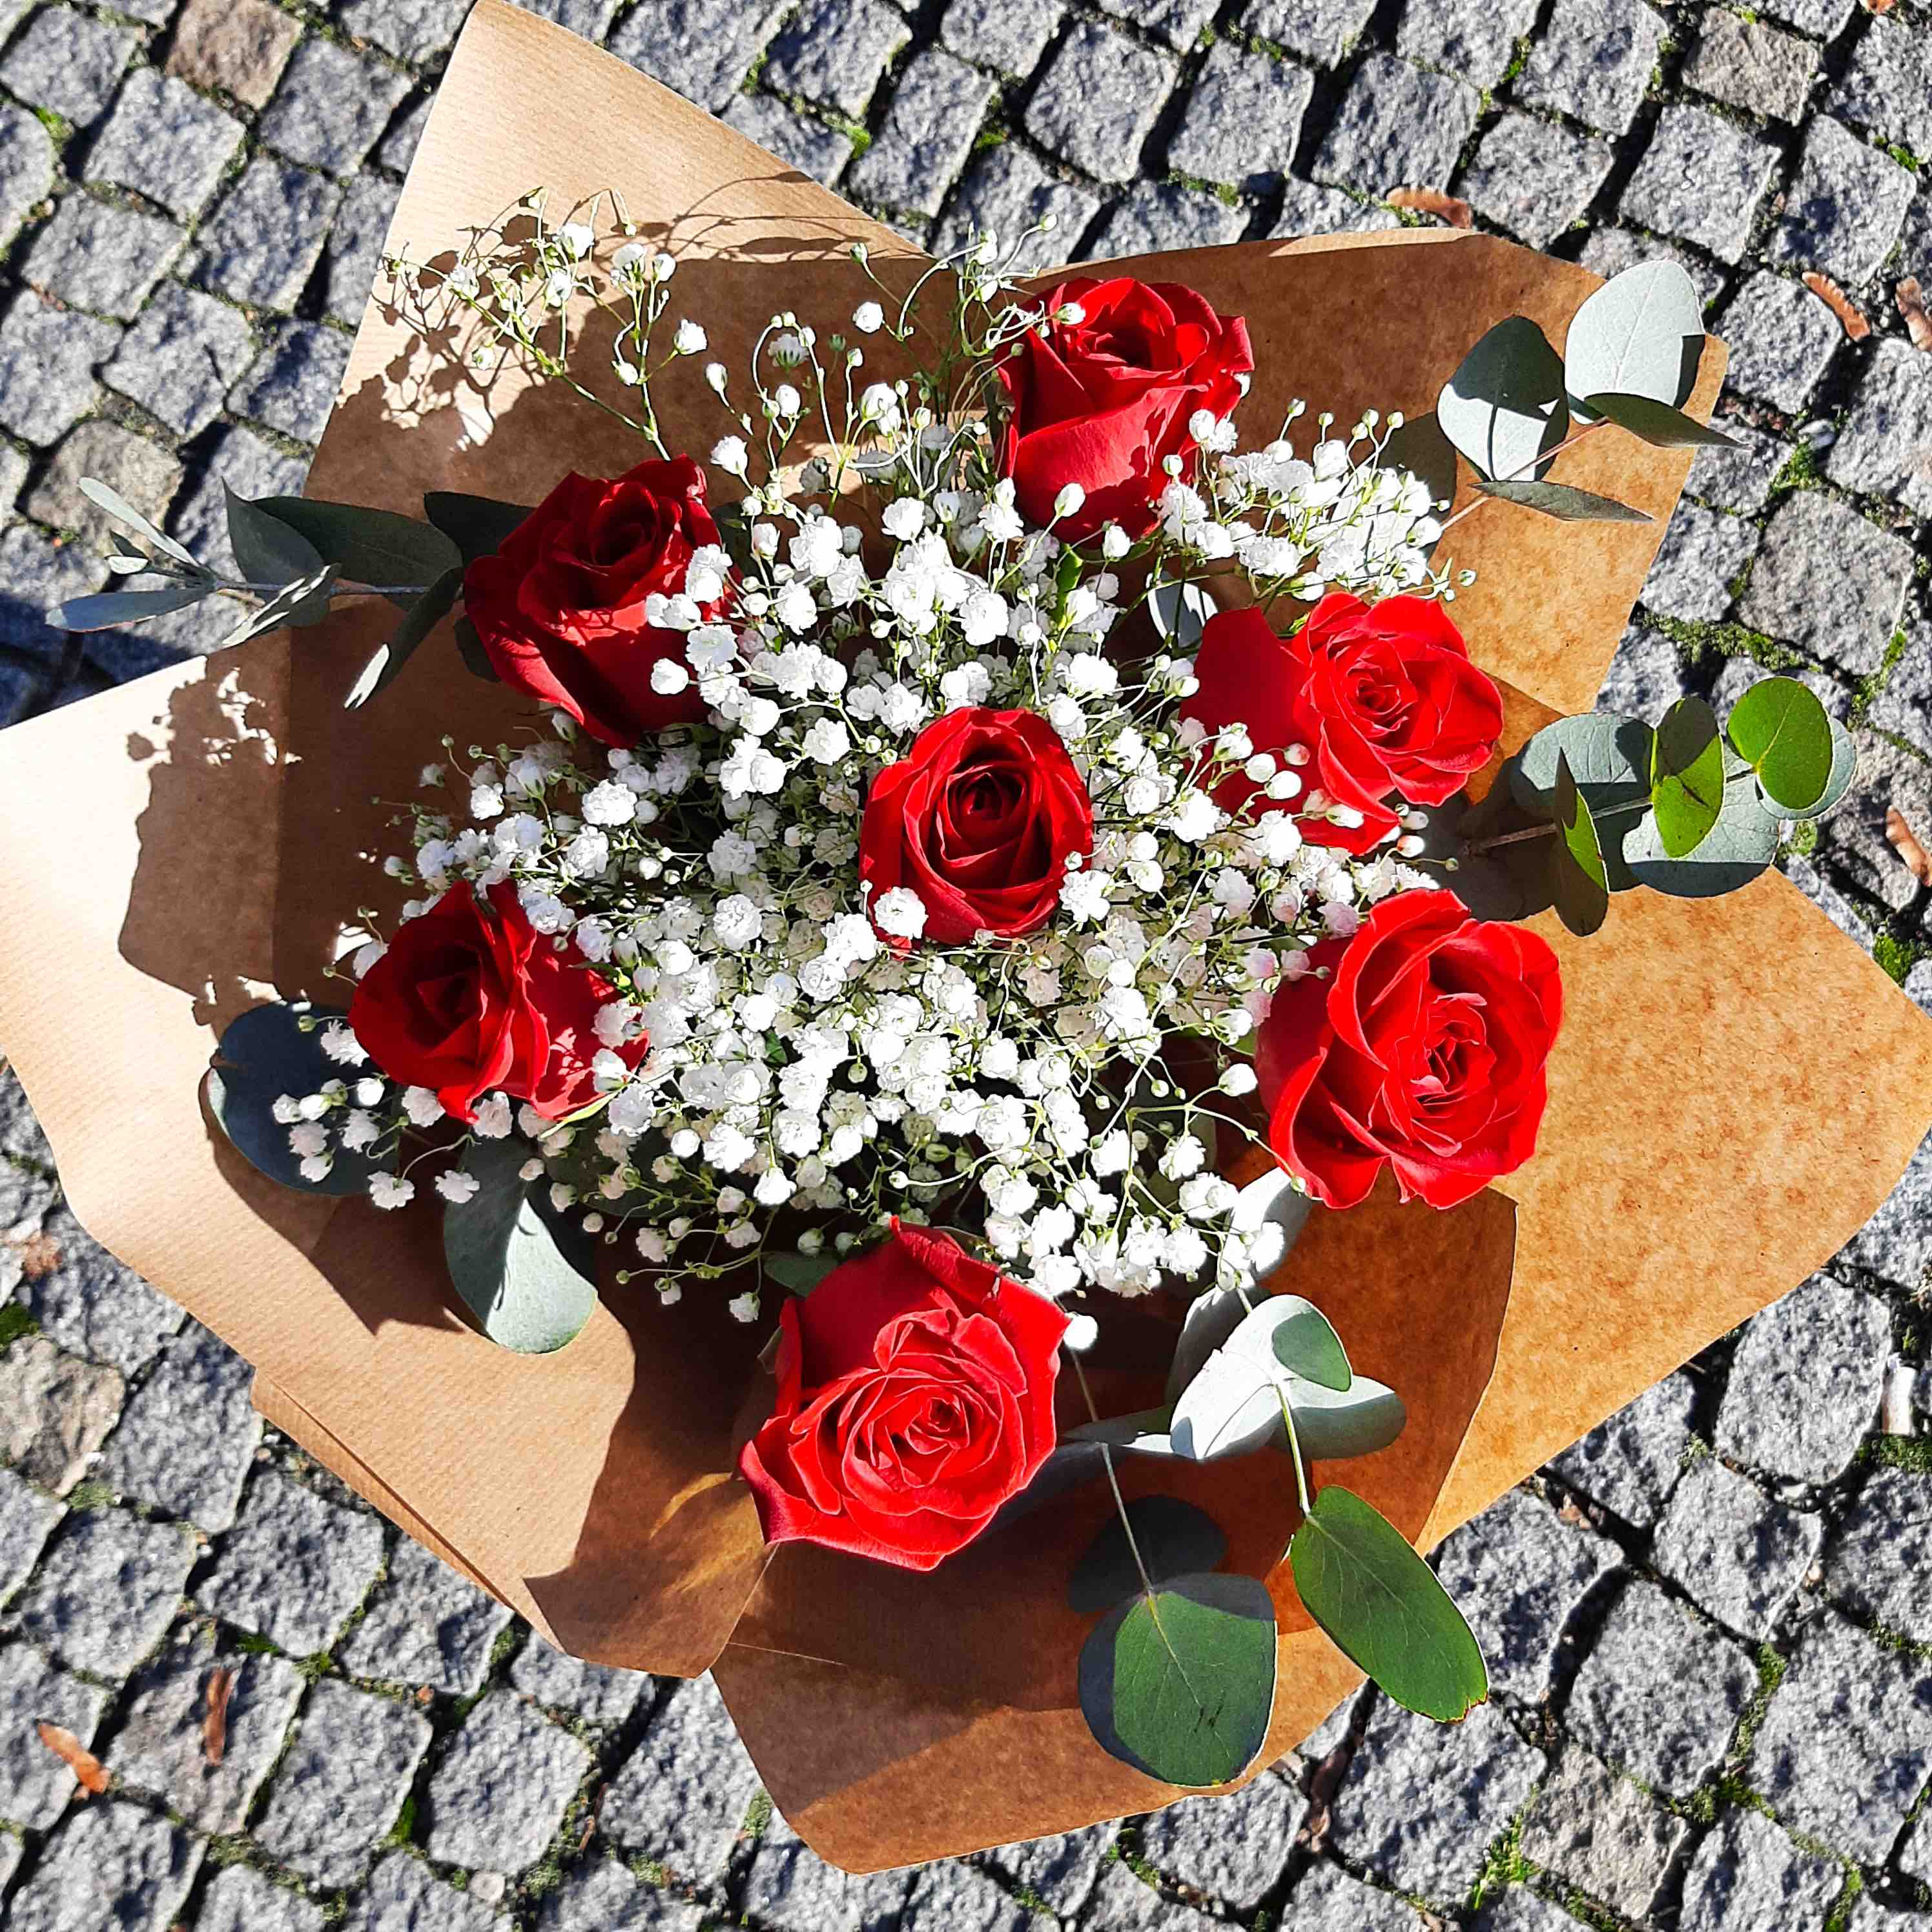 Růže, gypsofila a větvičky eukalyptu